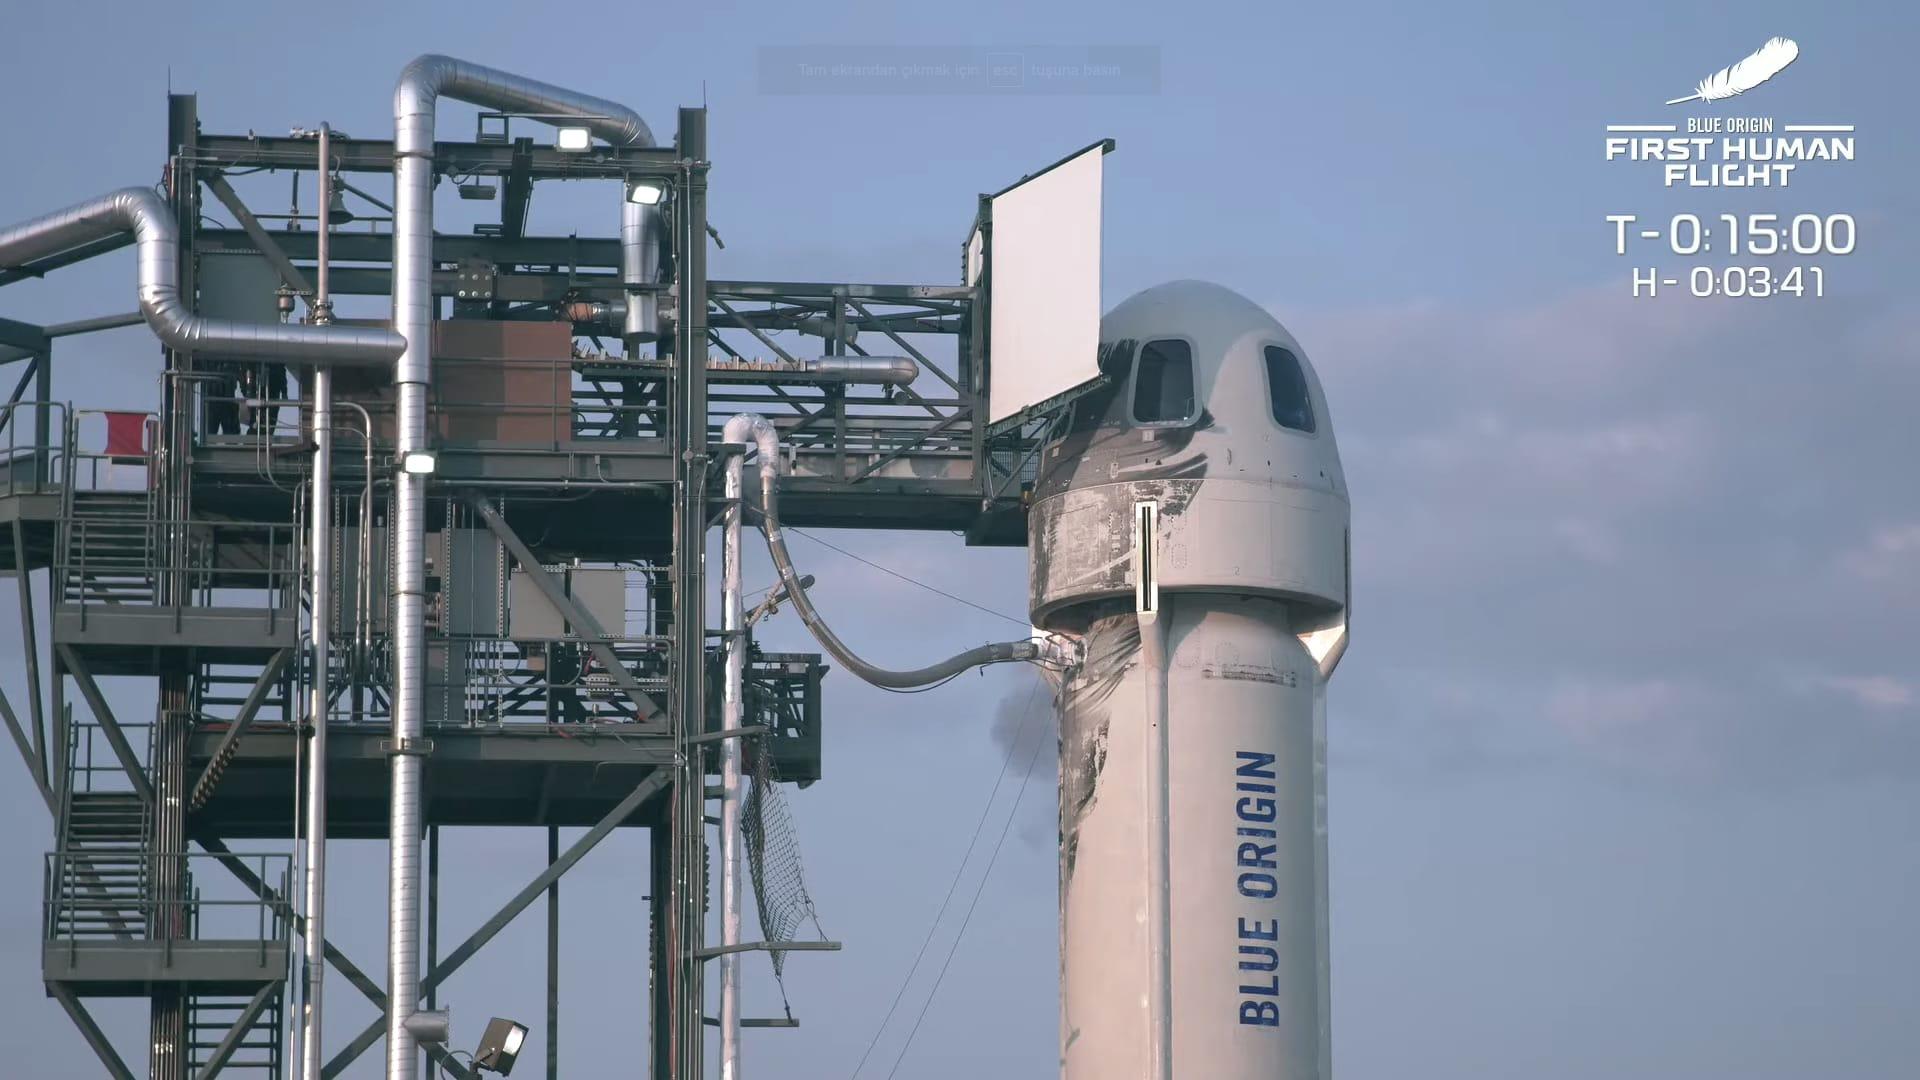 Jeff Bezos says Blue Origin sales of space tourist flights are 'approaching $100 million' already